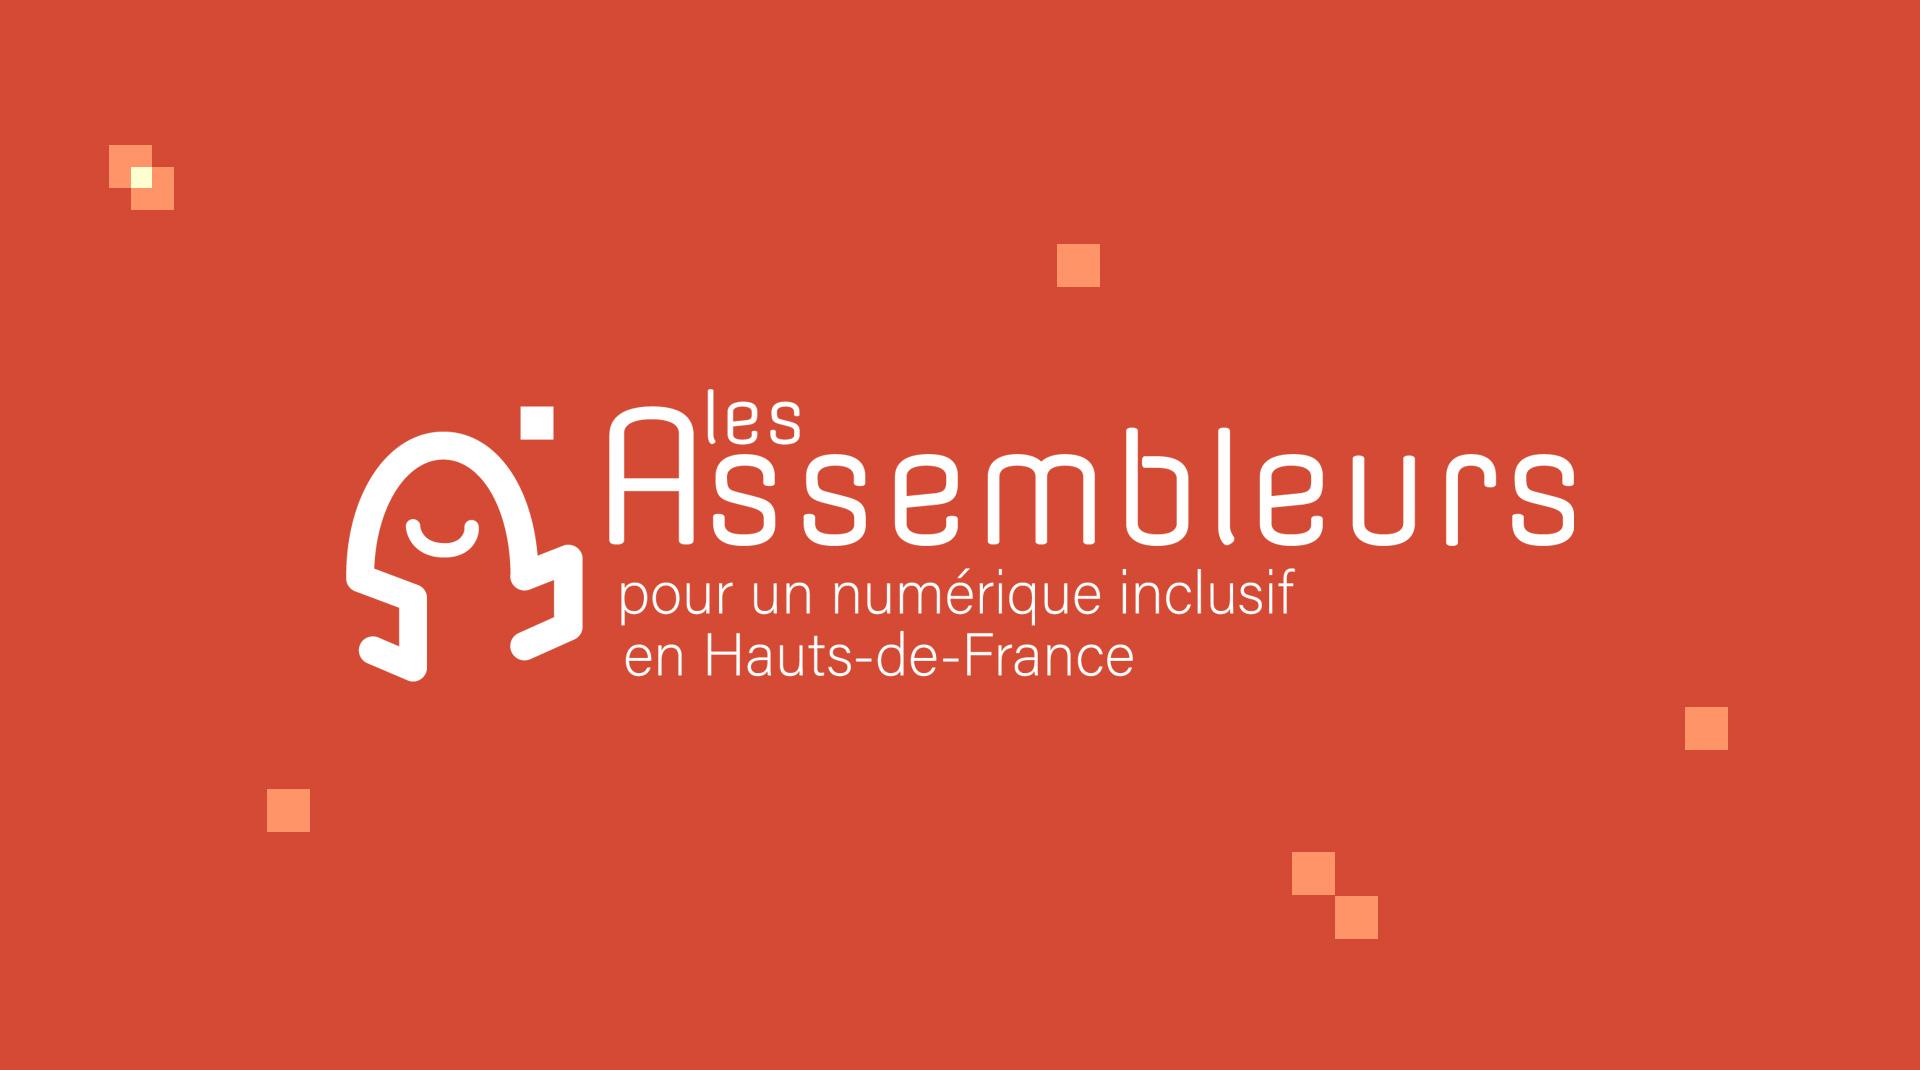 Assembleurs-BFPTC-01